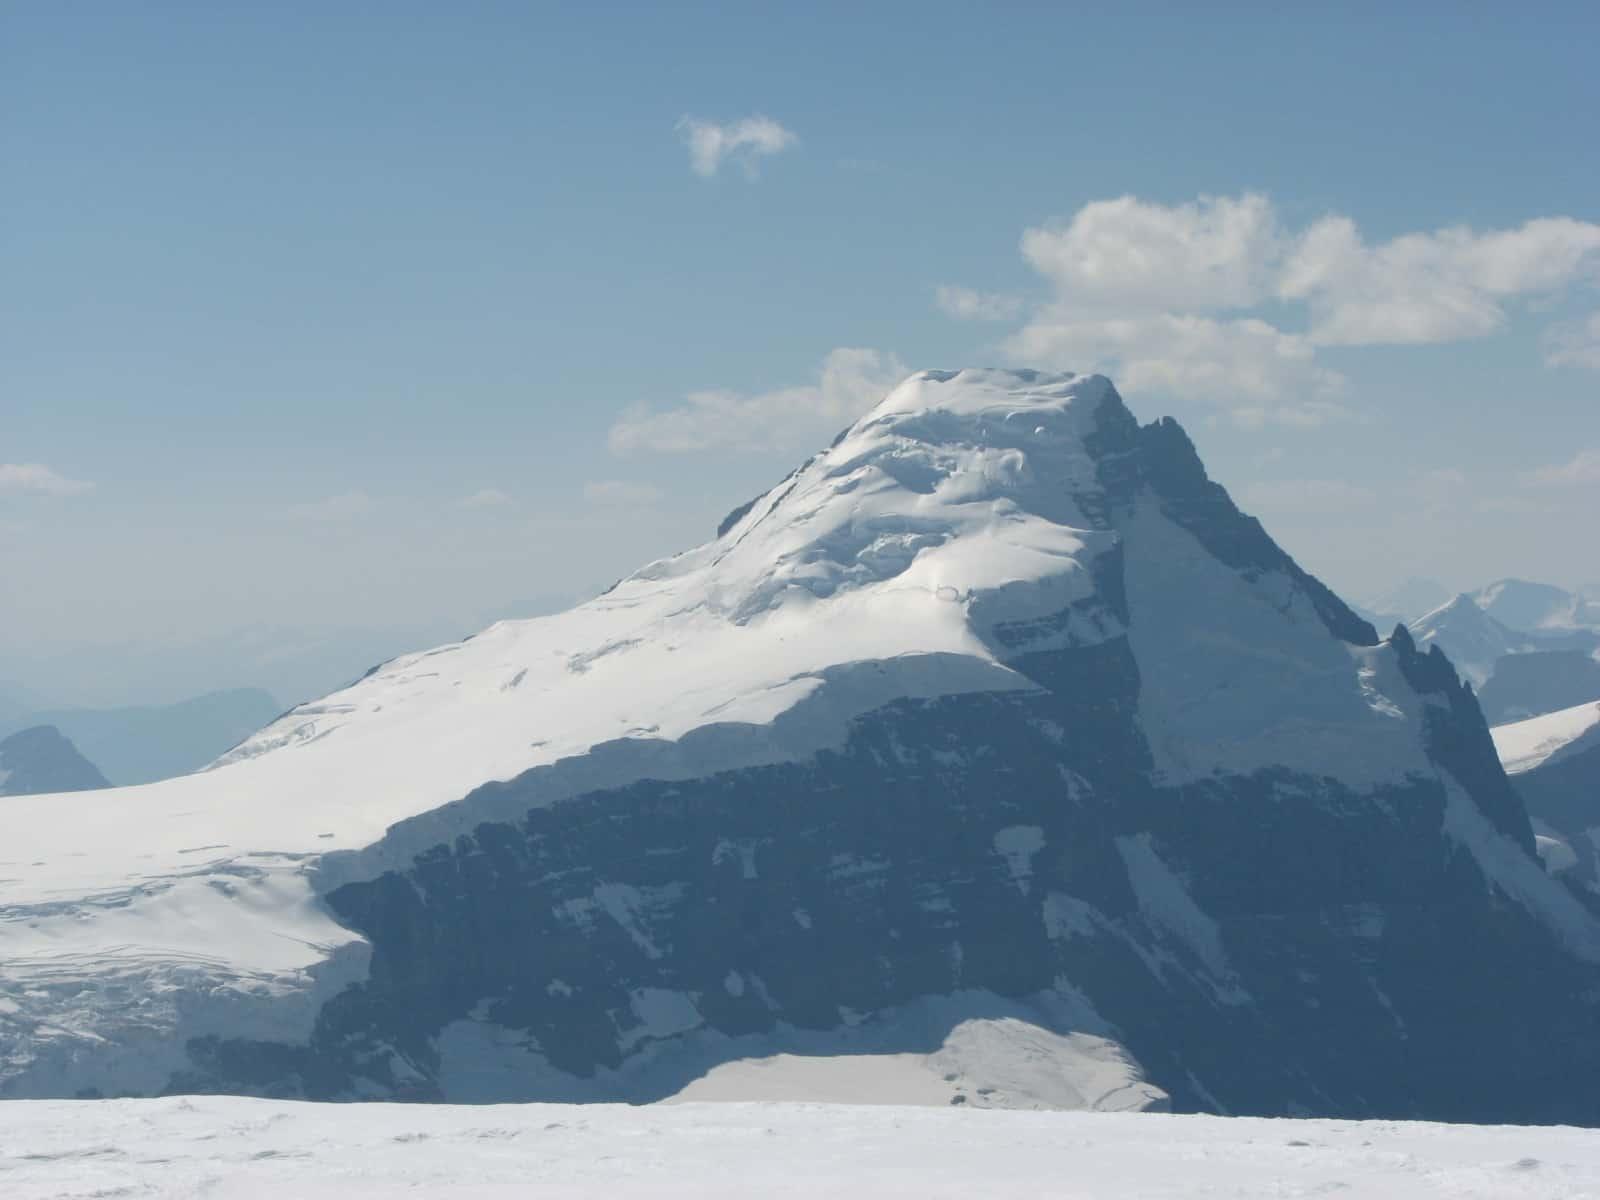 Mount Columbia Foto Geoffl (Public Domain)